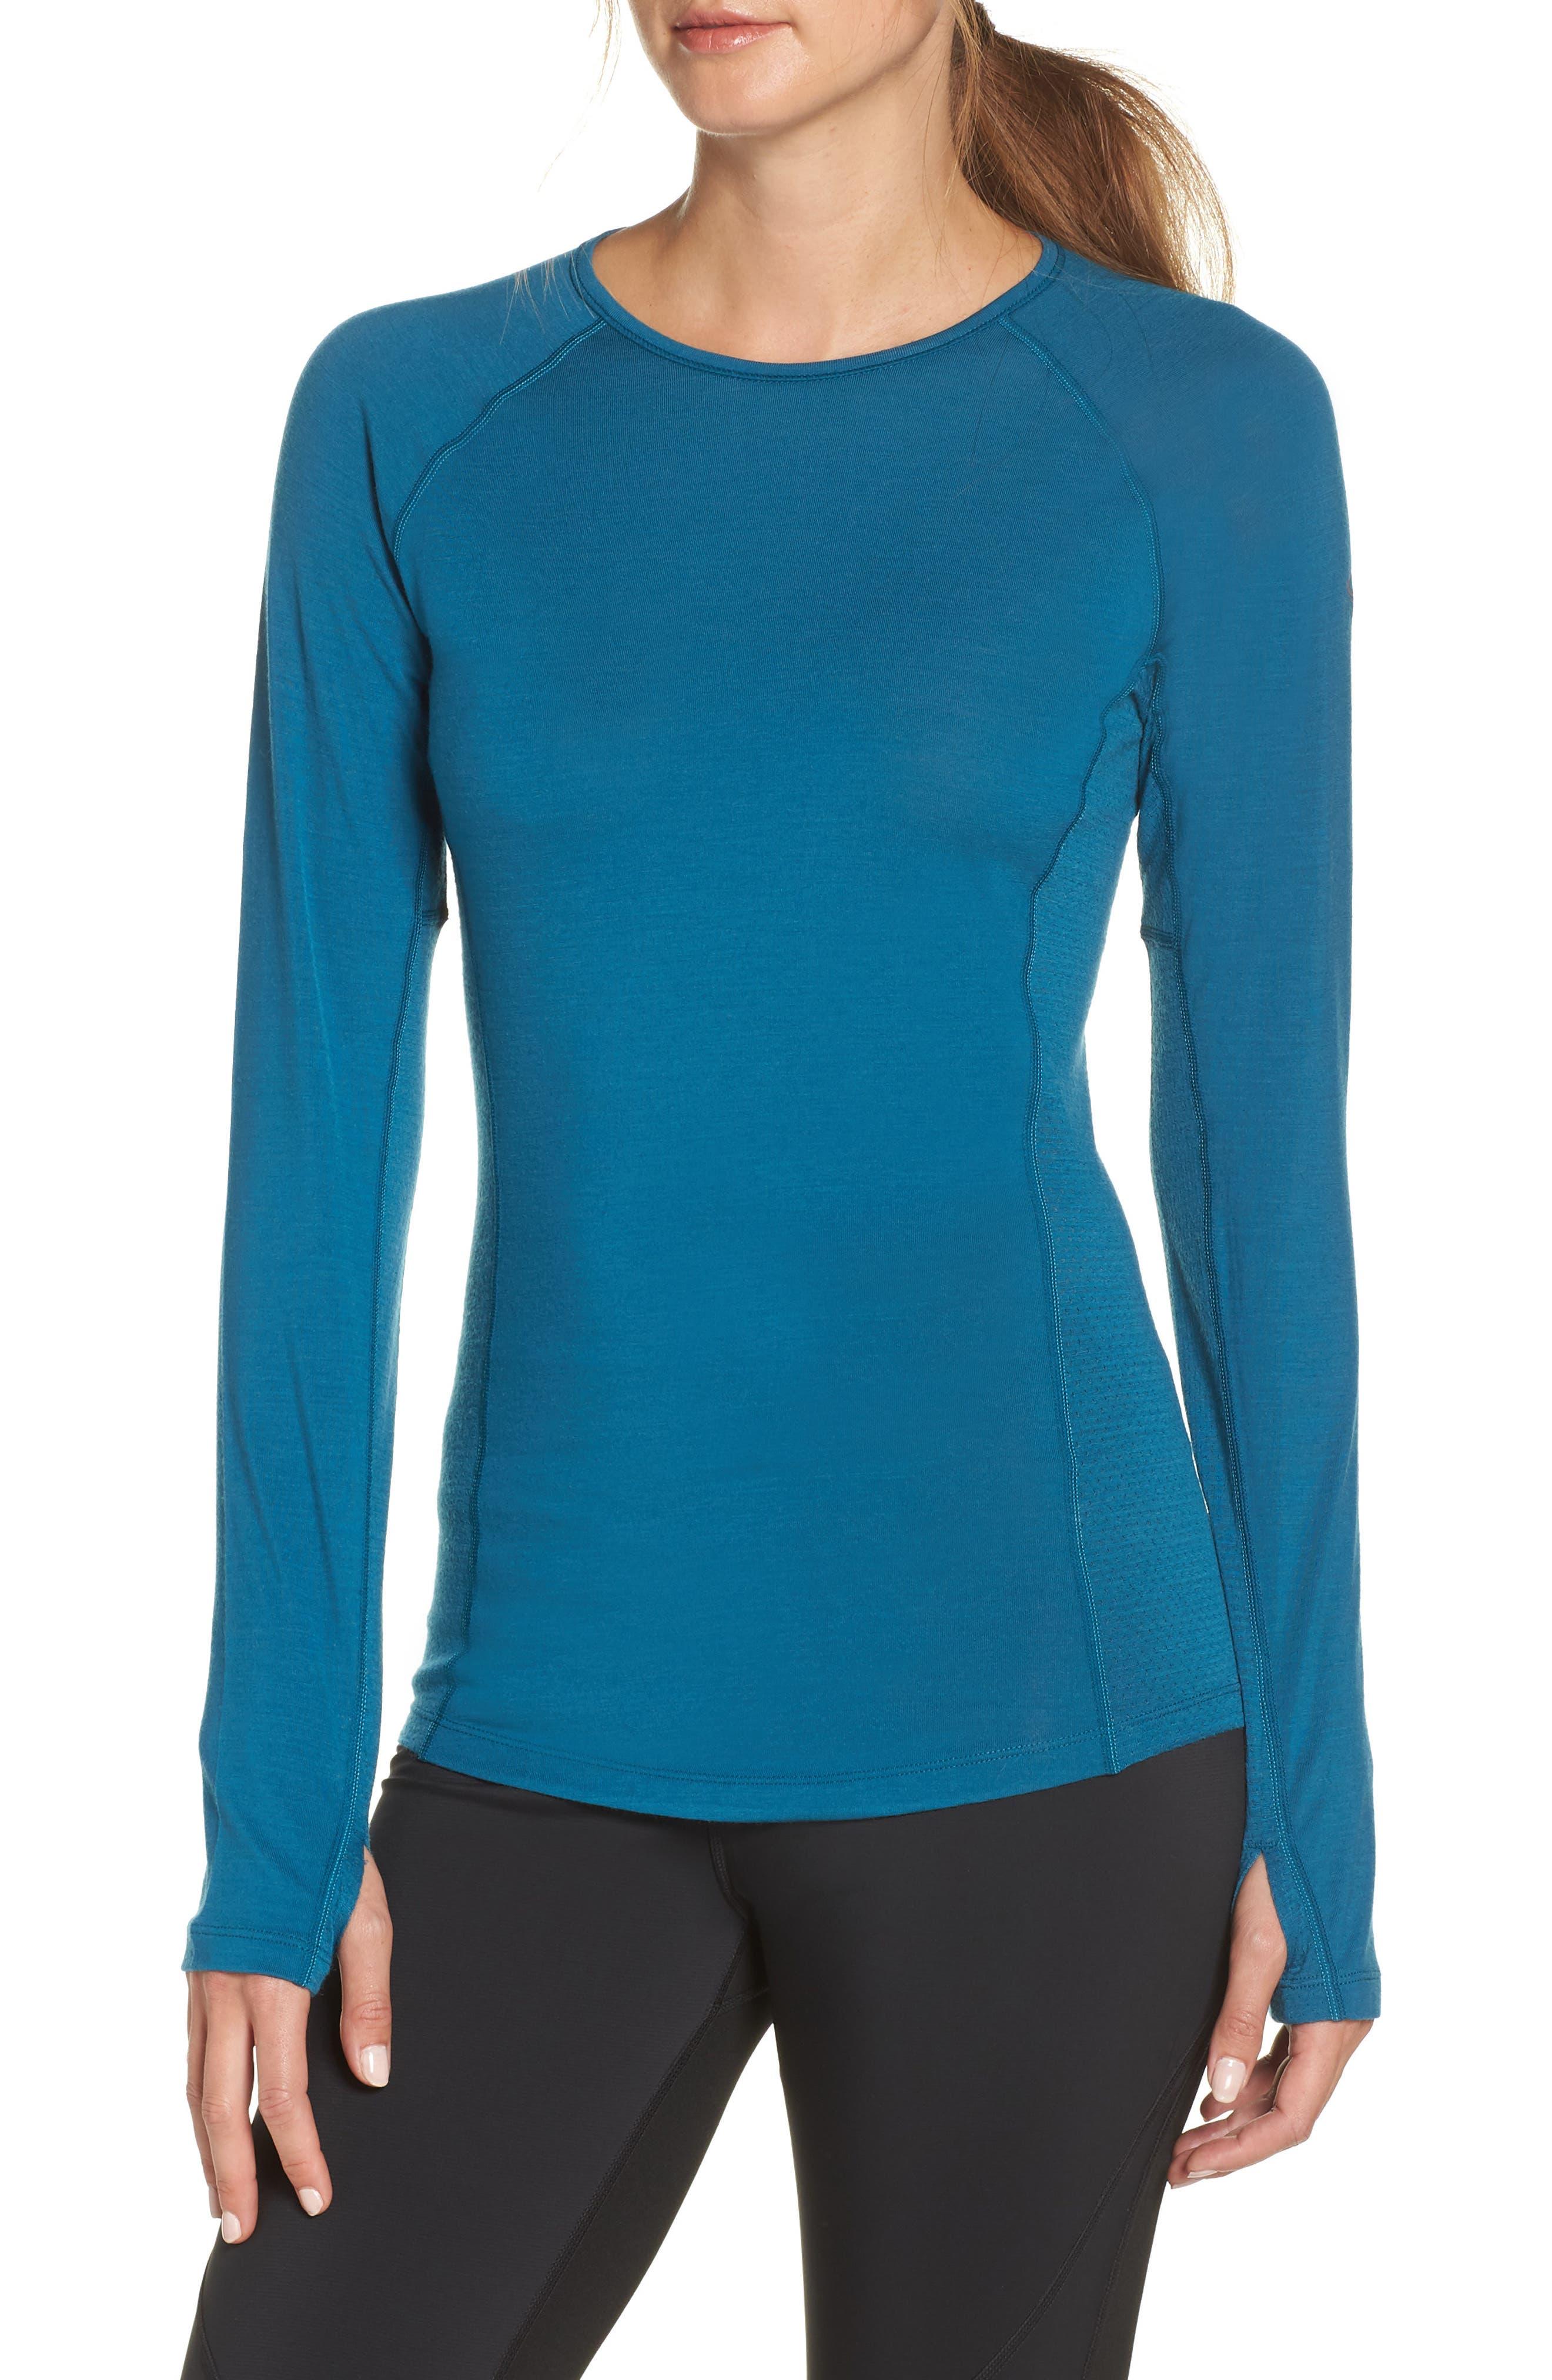 Icebreaker Bodyfitzone(TM) 150 Zone Merino Wool Blend Base Layer Tee